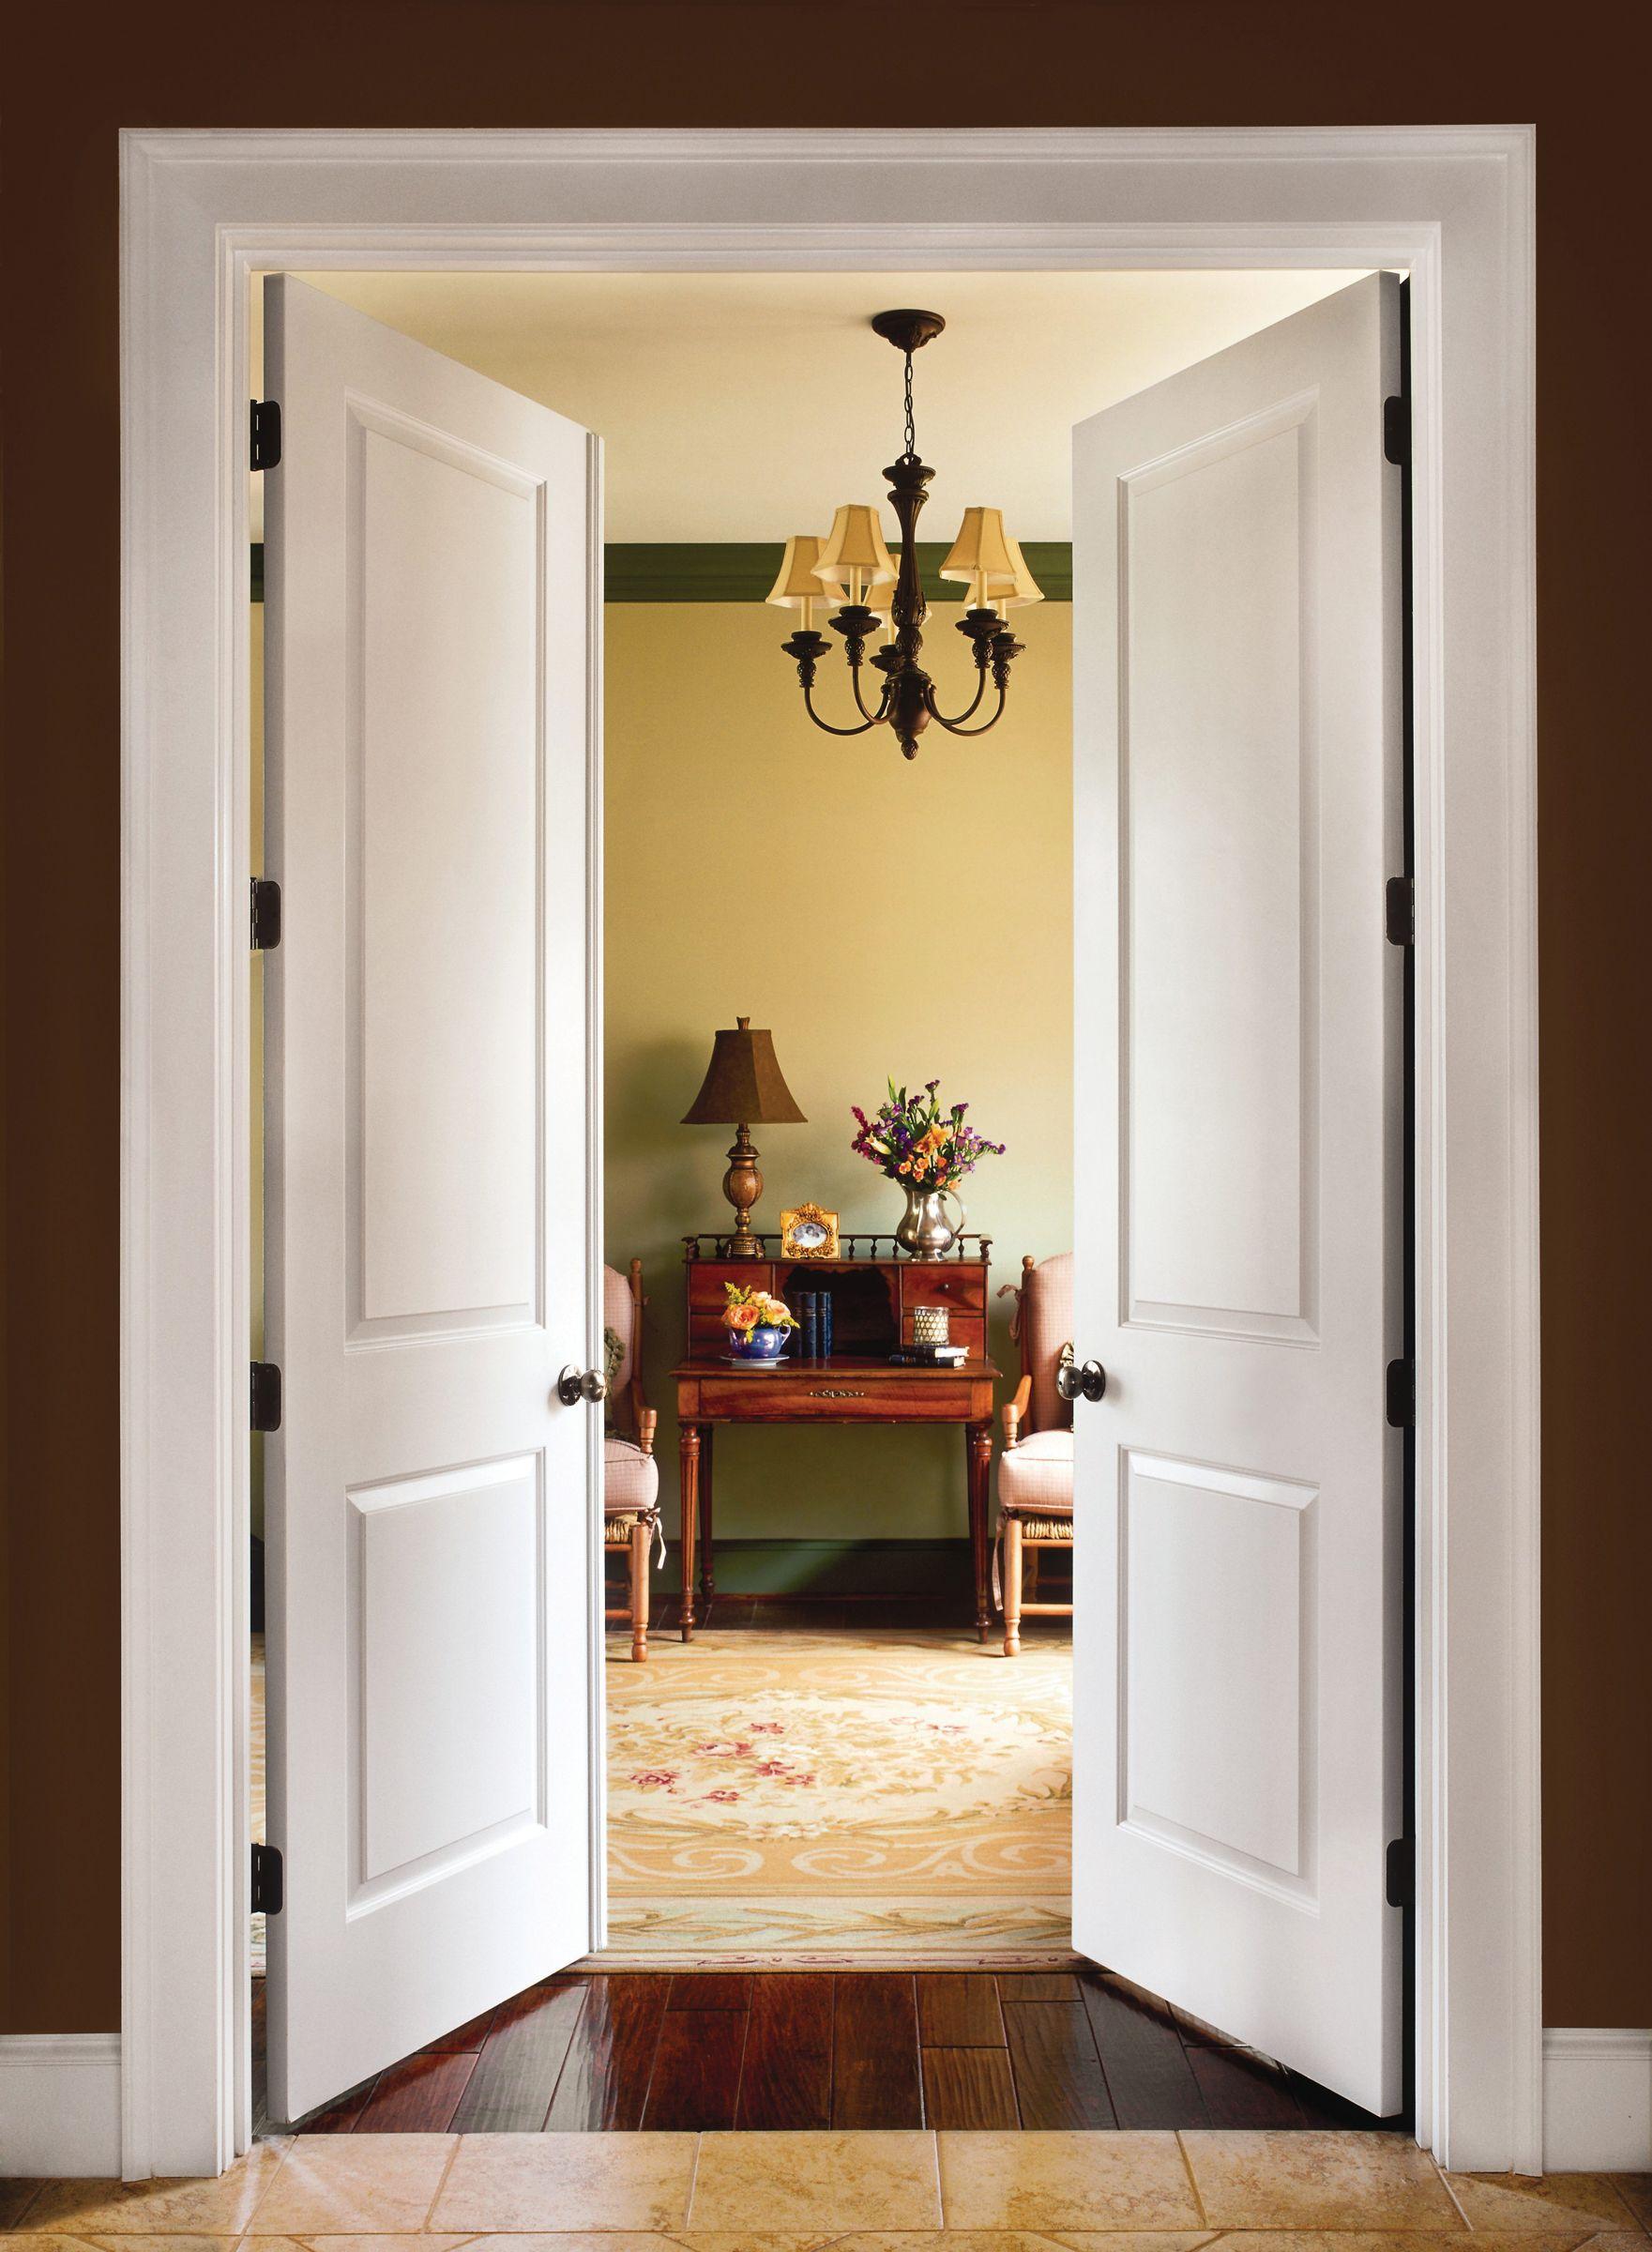 Cambridge Molded Interior French Doors Diy Moldeddoors Homeimprovement Forthehome Doubledoors Frenchd Rumah Kontemporer Rumah Minimalis Pintu Prancis